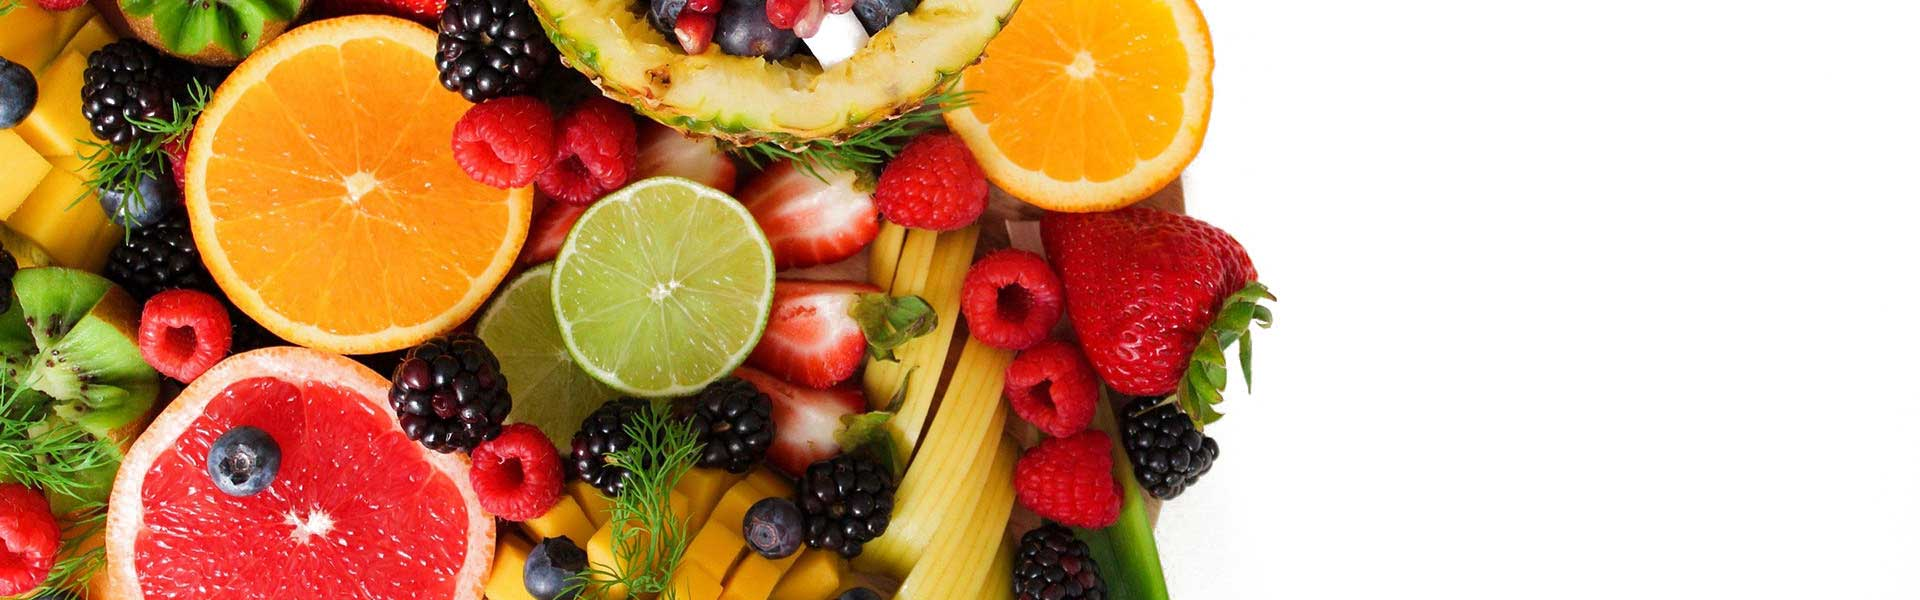 Groente en fruit, voedingscoach Fit ben Jij! weet er alles van